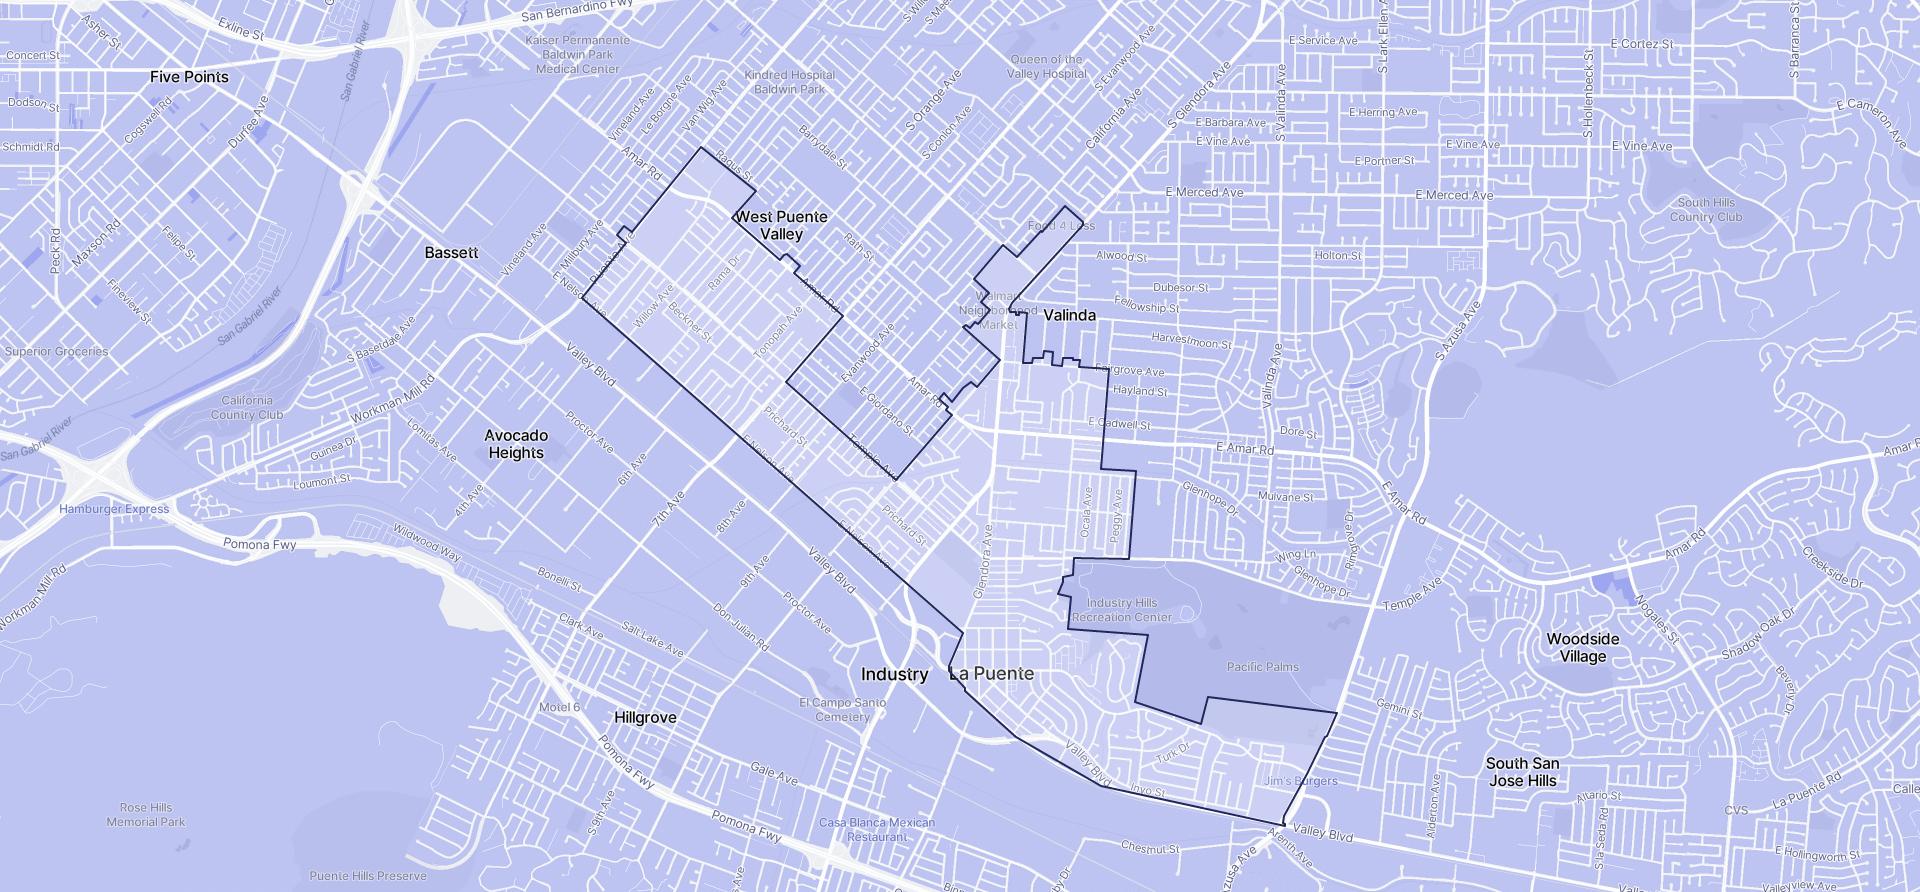 Image of La Puente boundaries on a map.